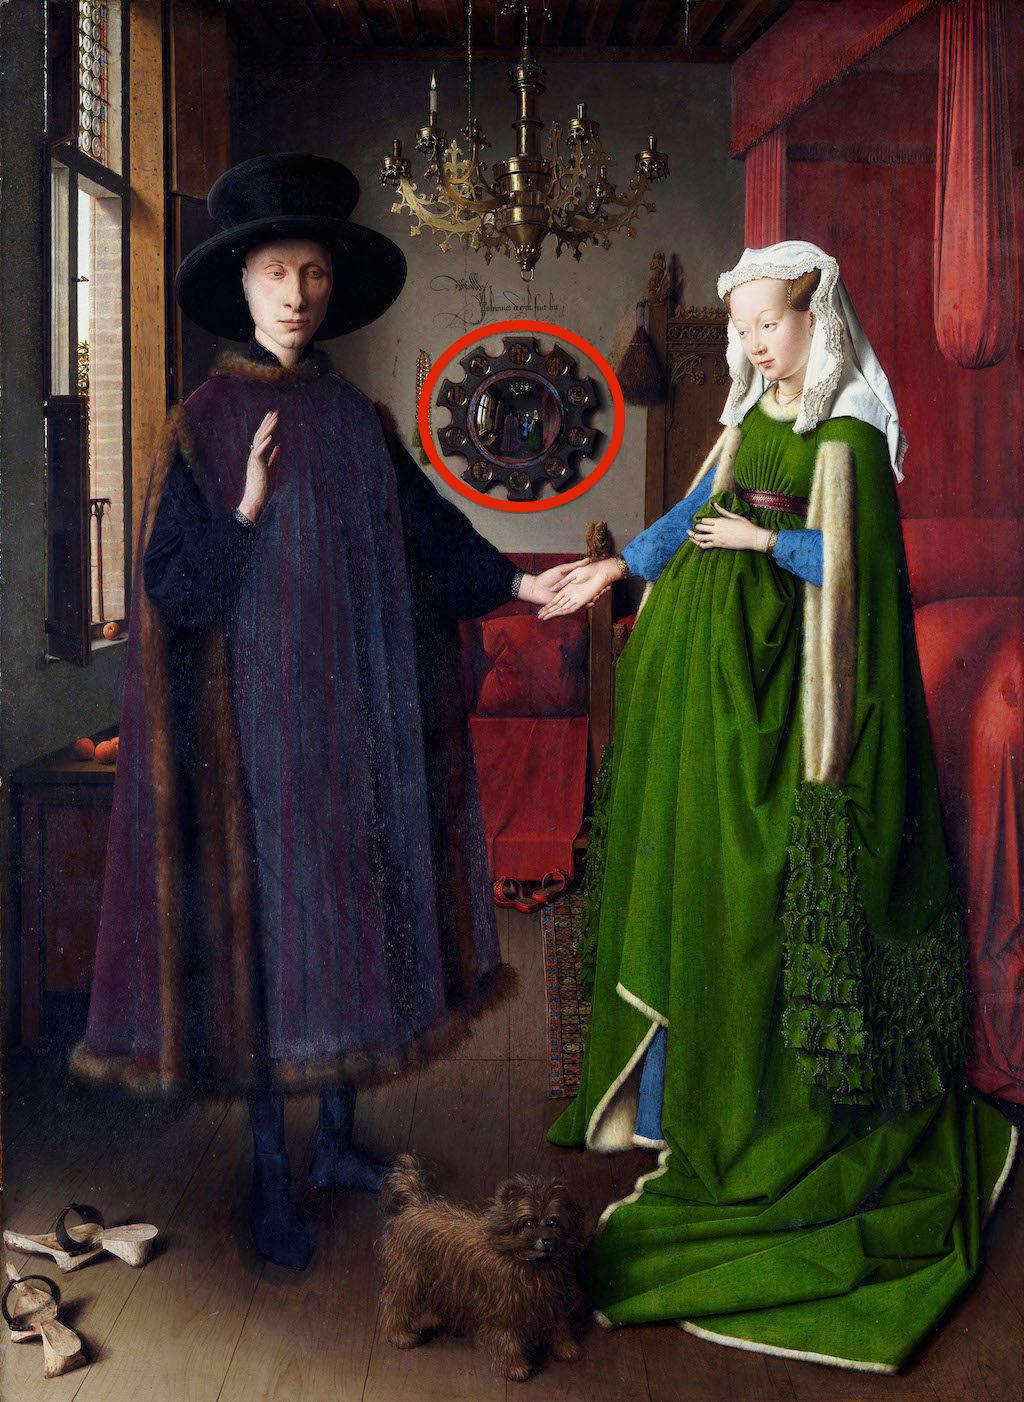 DHXB1X The Arnolfini Portrait - by Jan van Eyck, 1434